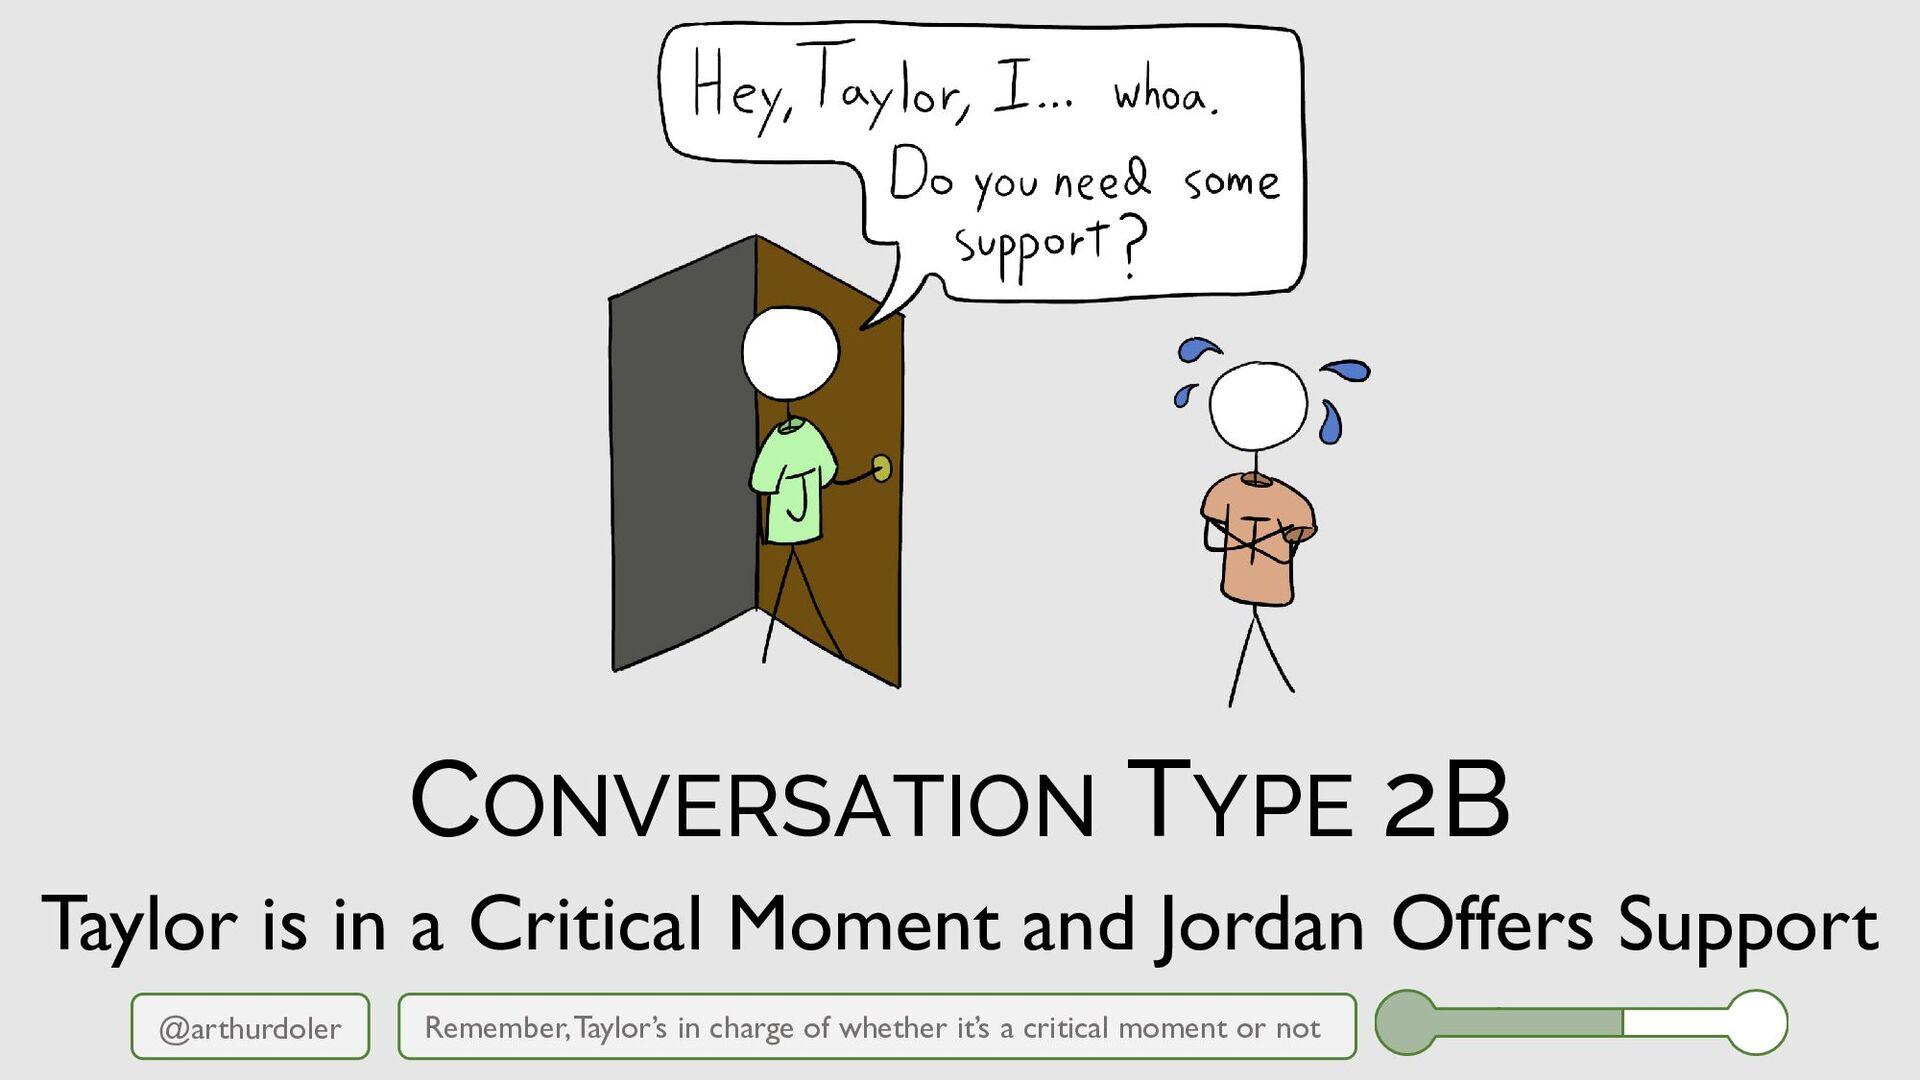 @arthurdoler CONVERSATION TYPE 2B Remember, Tay...